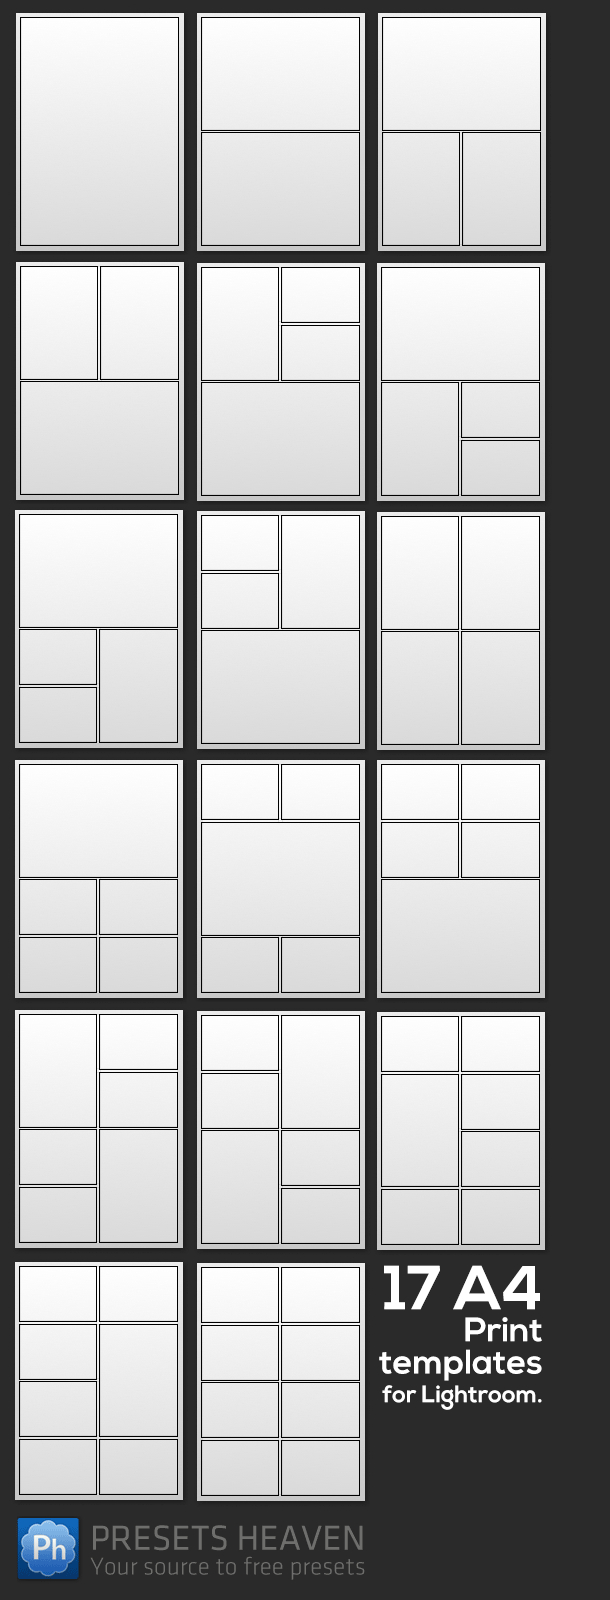 17 Free Print Templates For Lightroom | Free Lightroom Stuff - Free Printable Photo Collage Template